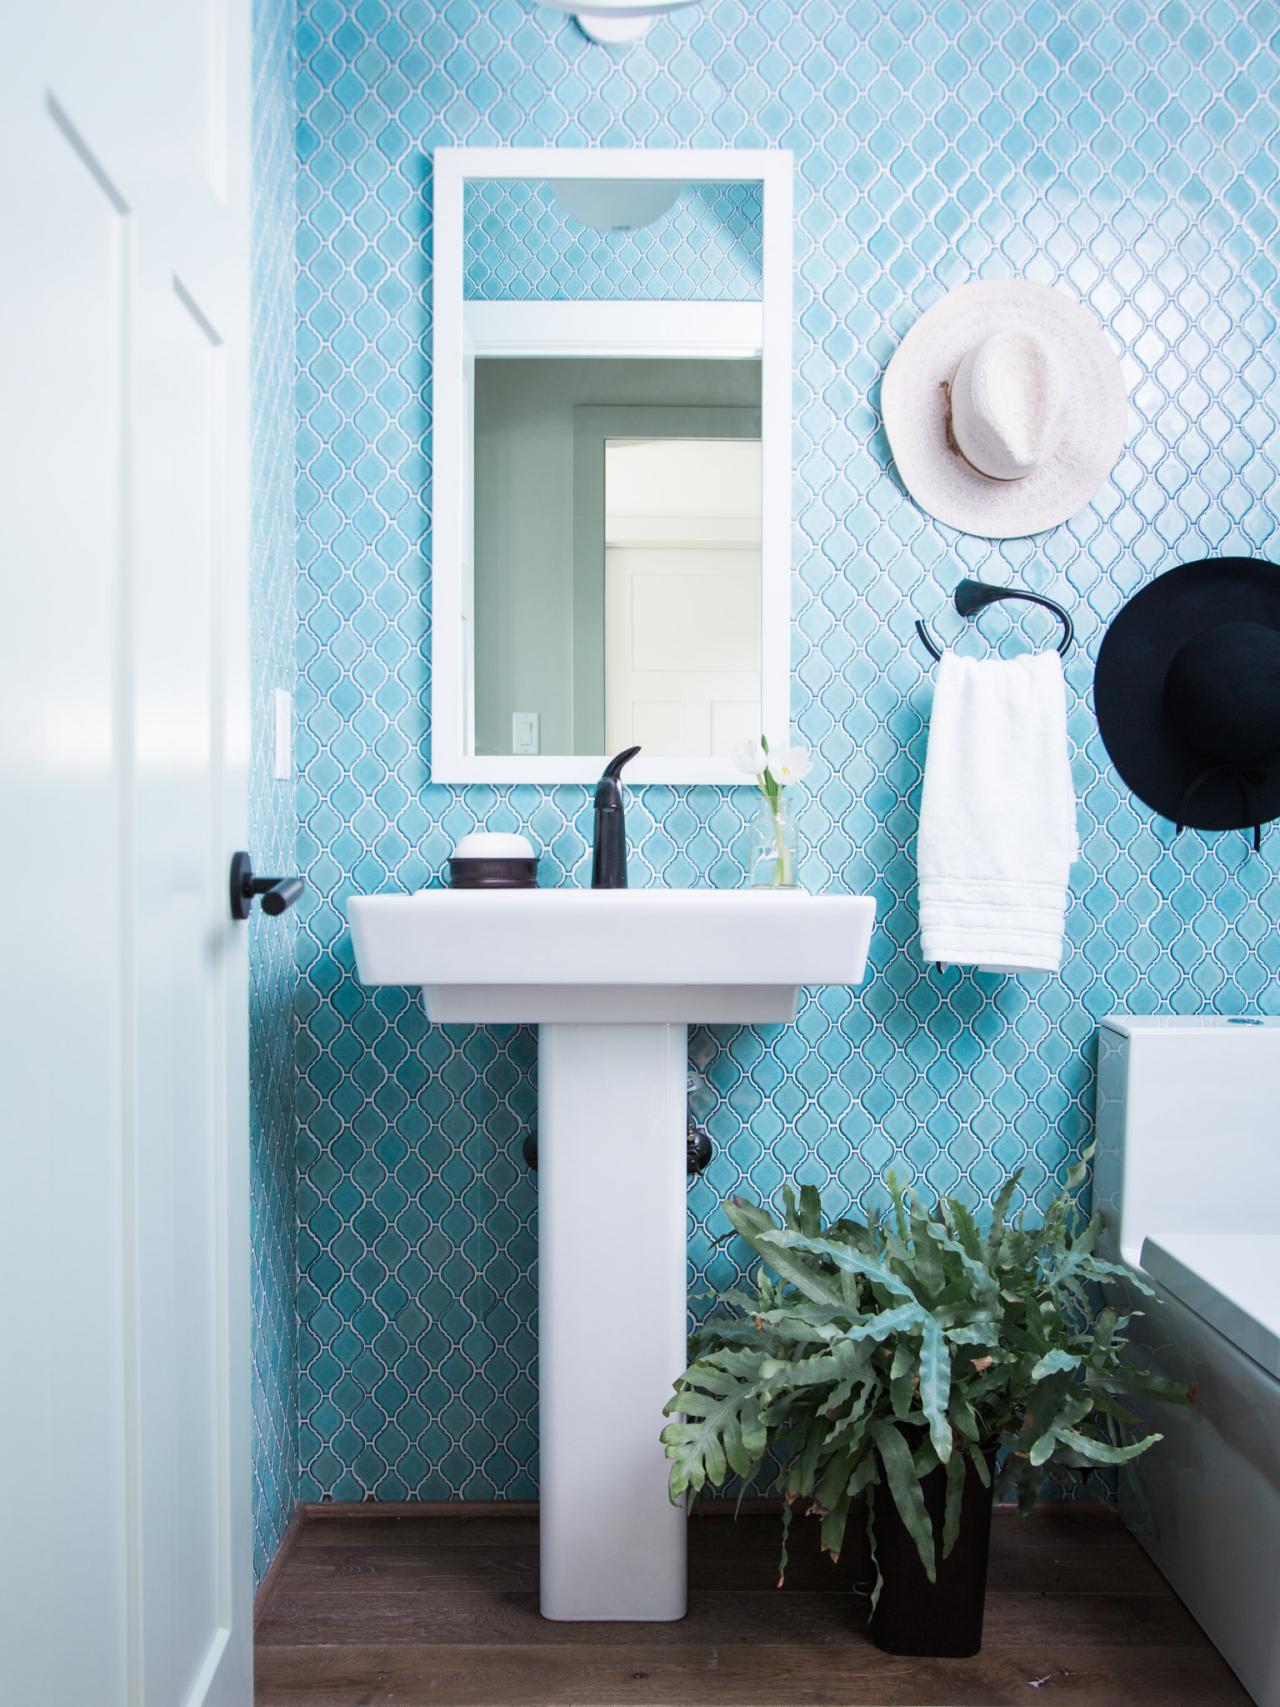 Small bathroom decorating ideas hgtv - Bathroom ideas for small bathrooms ...